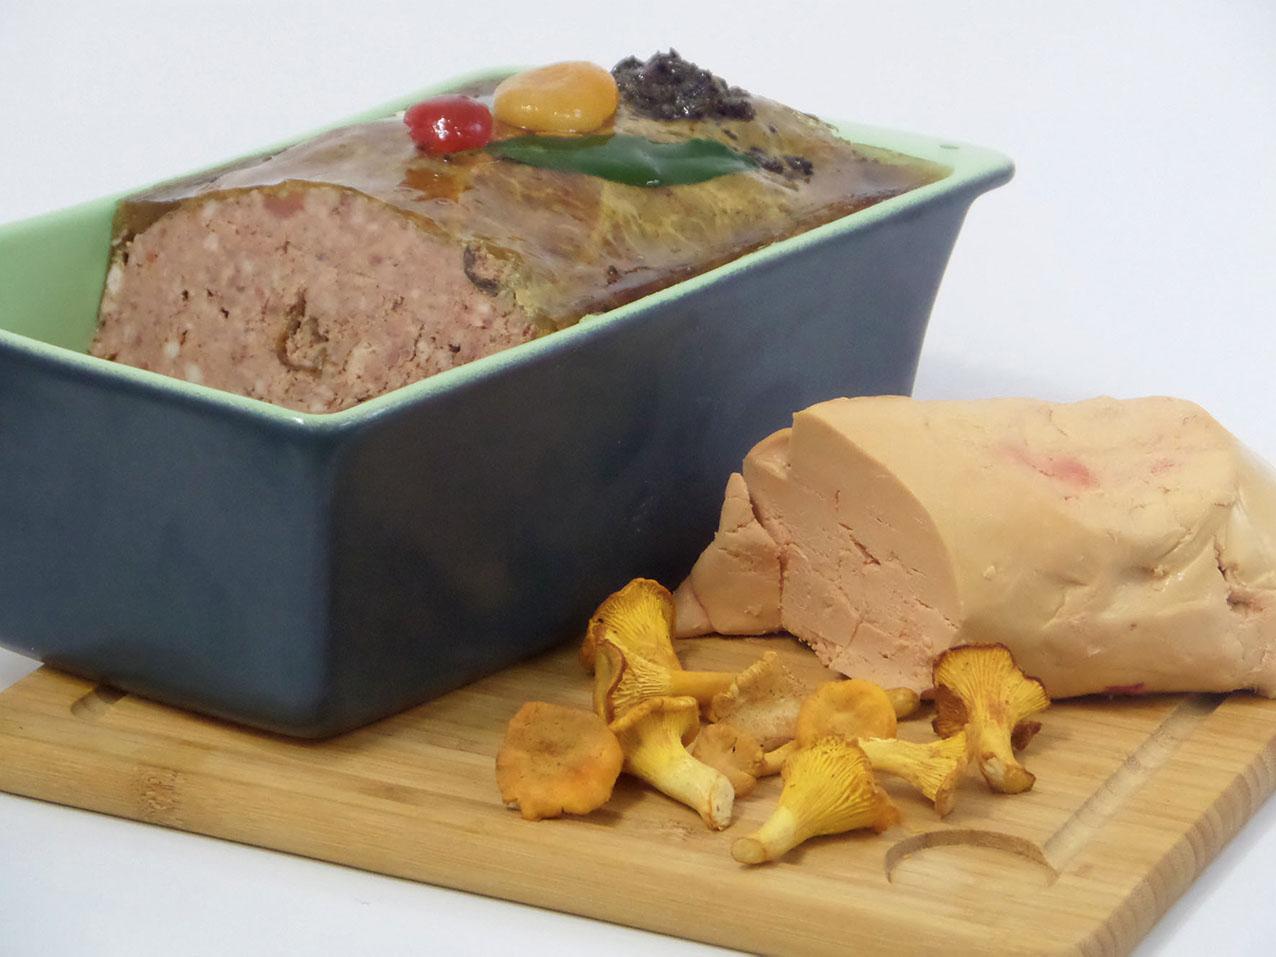 Terrine de Canard au foie gras et girolles